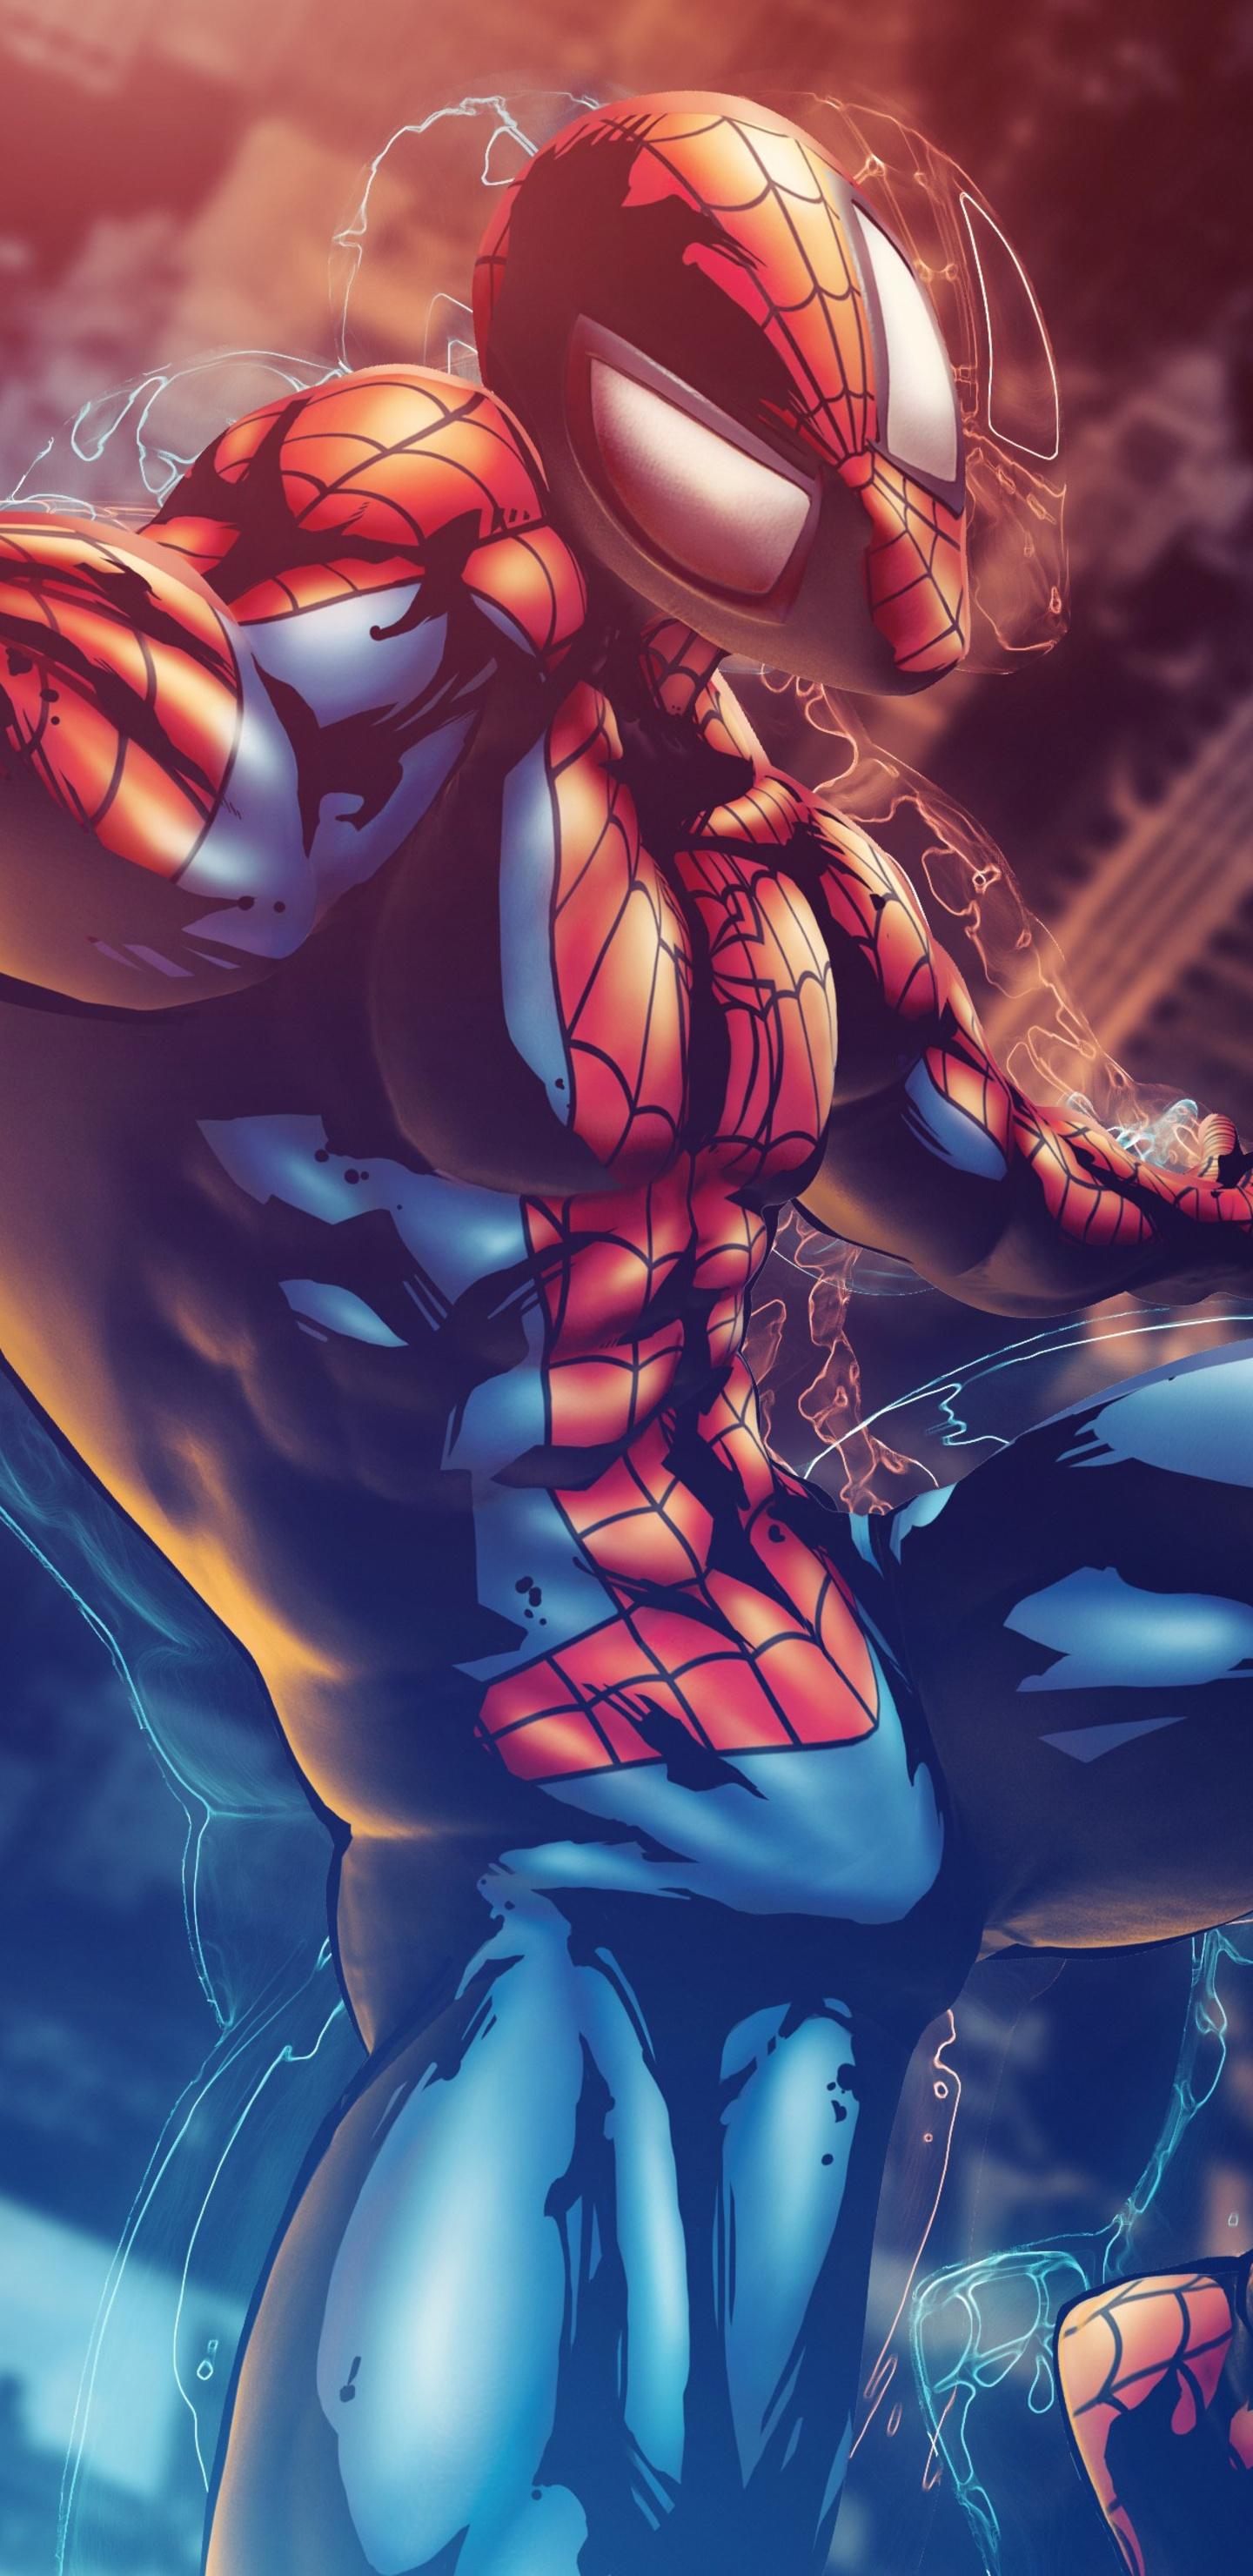 1440x2960 Marvel Vs Capcom 3 Spiderman 4k Samsung Galaxy